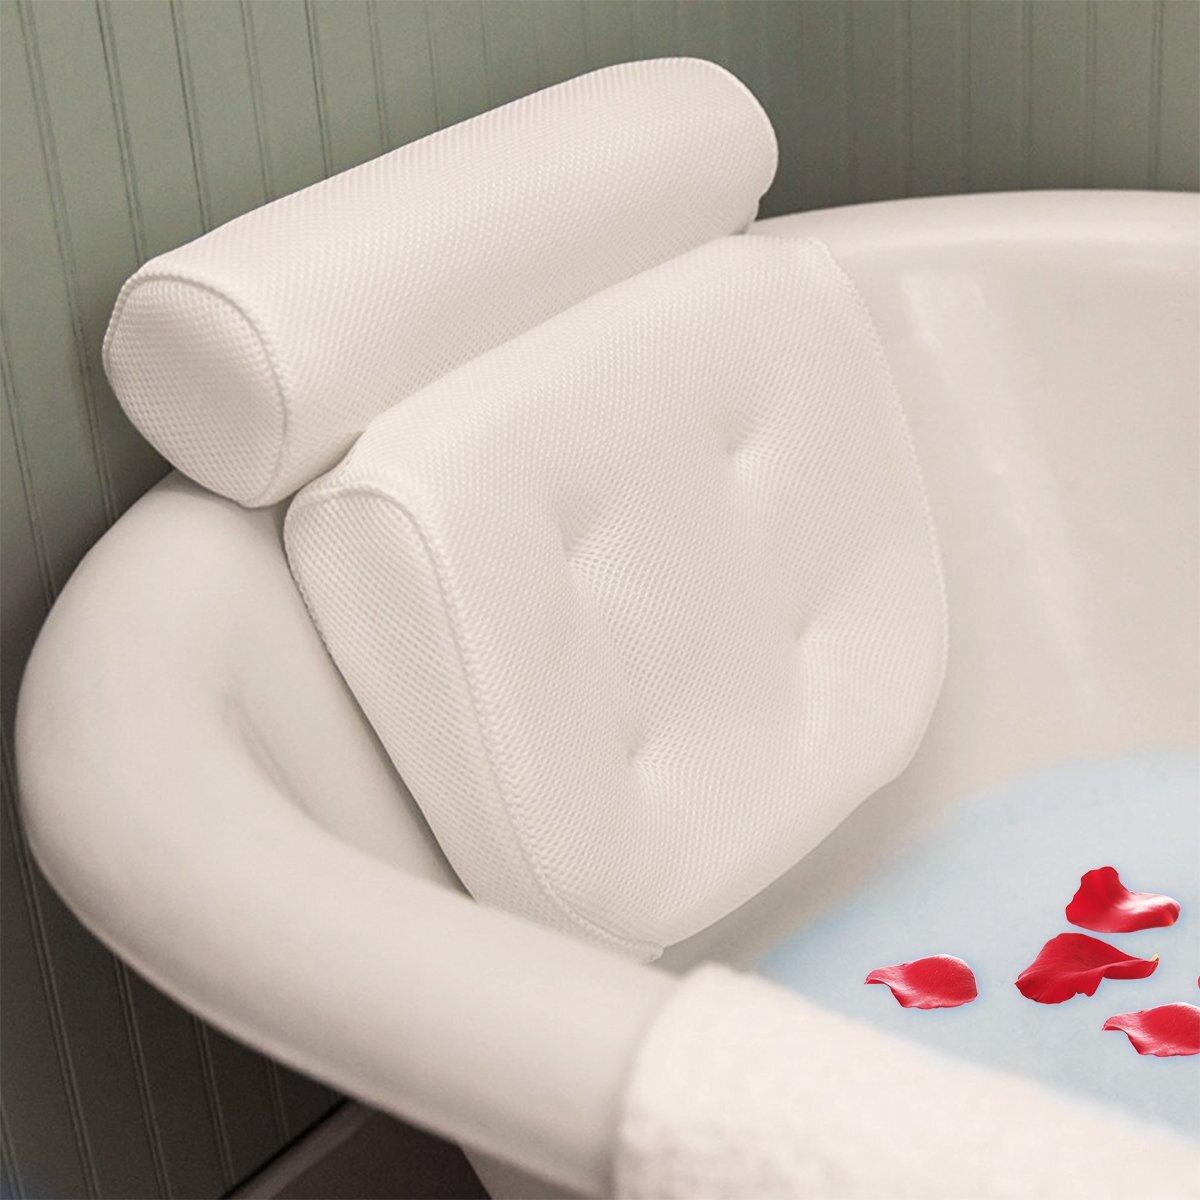 Thickened Bath Tub Pillow SPA Soft Headrest Bathtub Pillow With Backrest Comfortable Neck Cushion